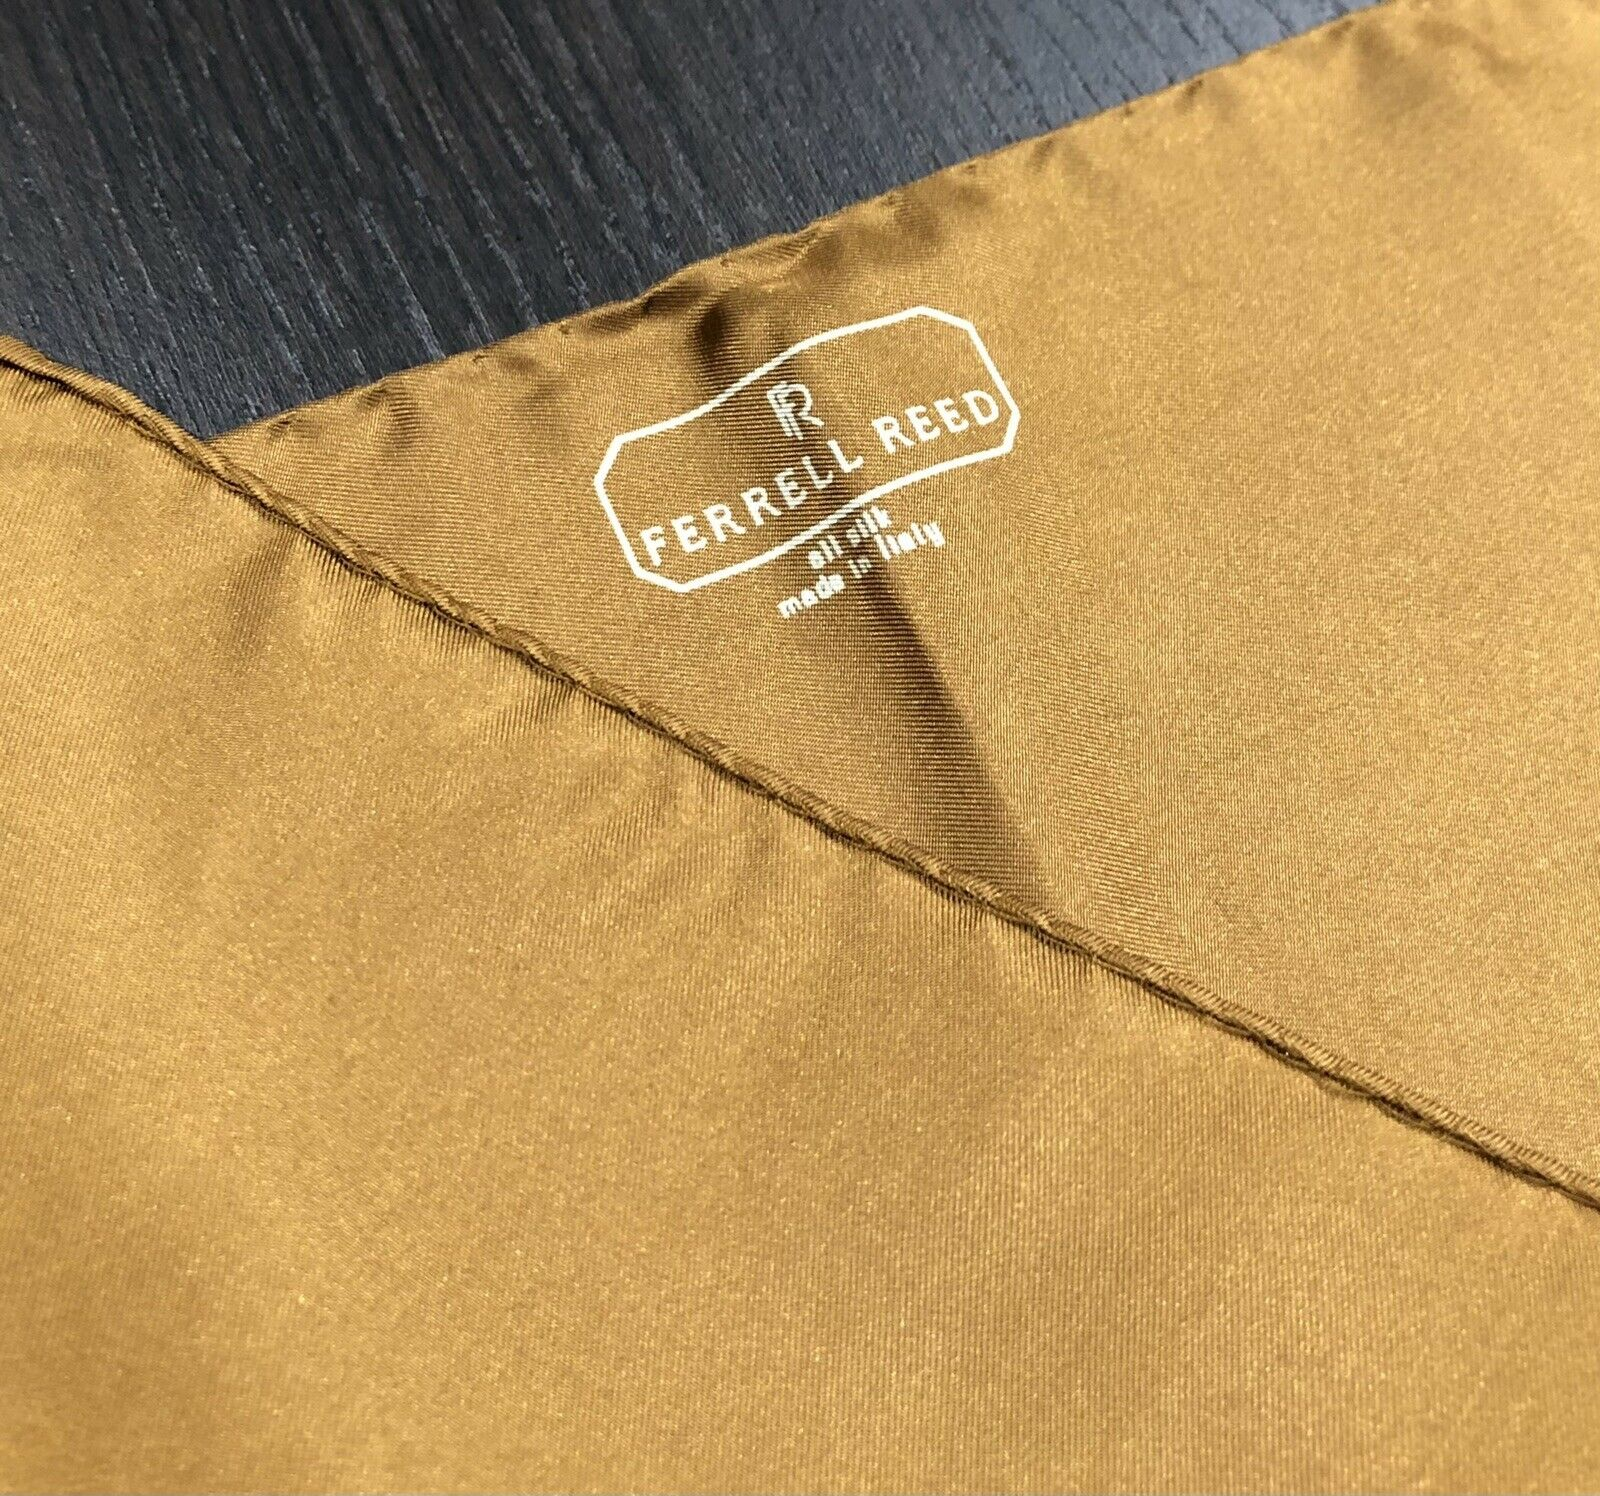 "Ferrell Reed Made In Italy Orange Silk Pocket Square 17"" Handkerchief EUC"